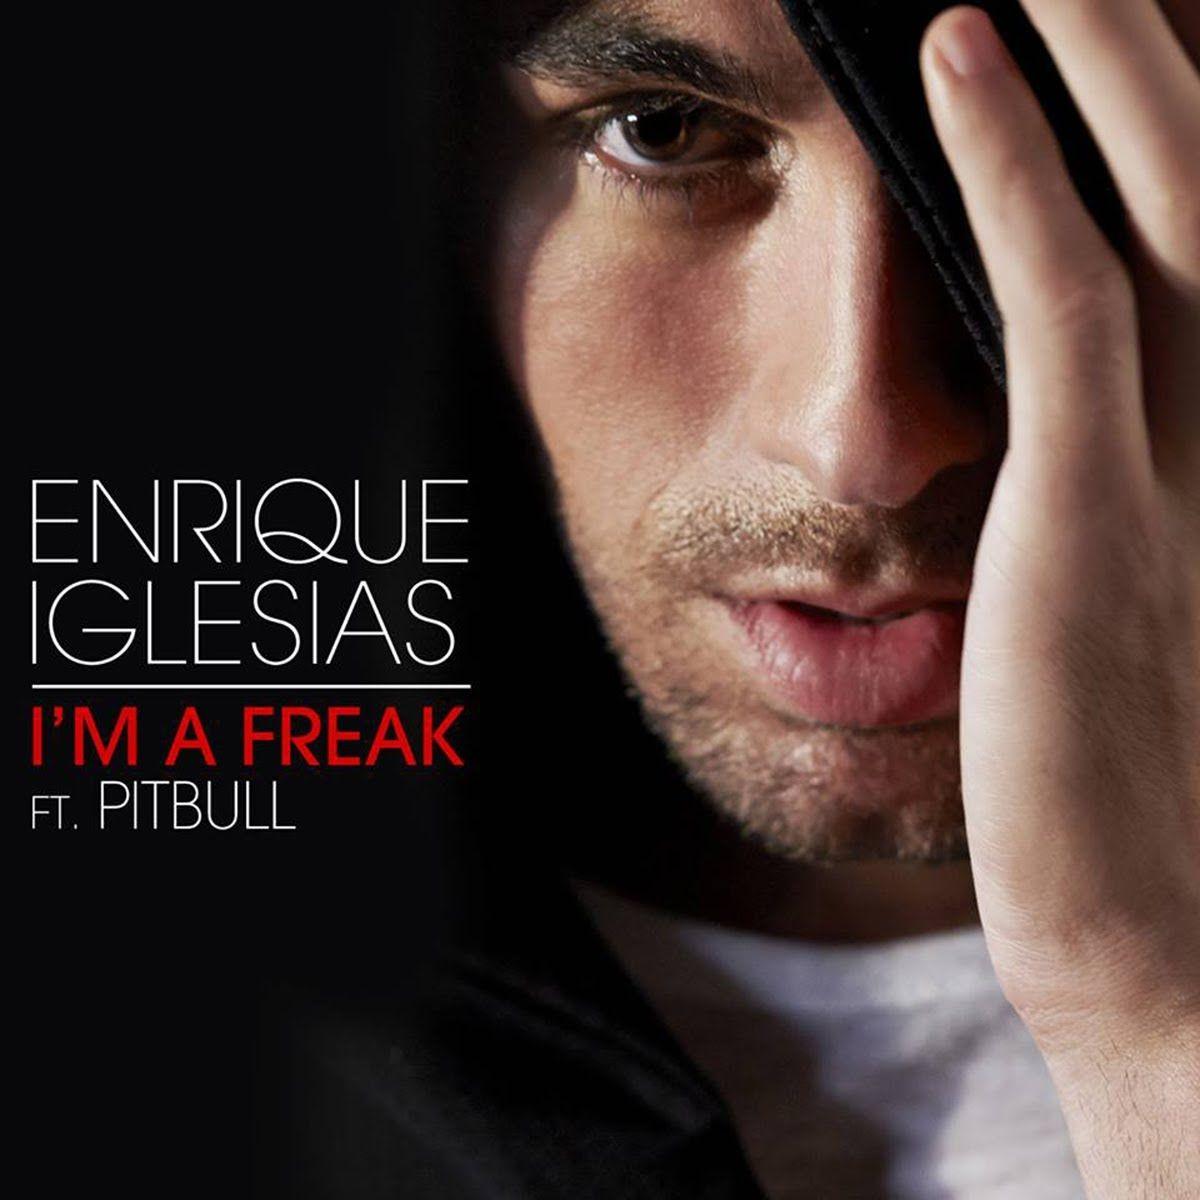 Enrique Iglesias Pic8866 دانلود آهنگ Im a Freak از انریکه ایگلسیاس و Pitbull با متن